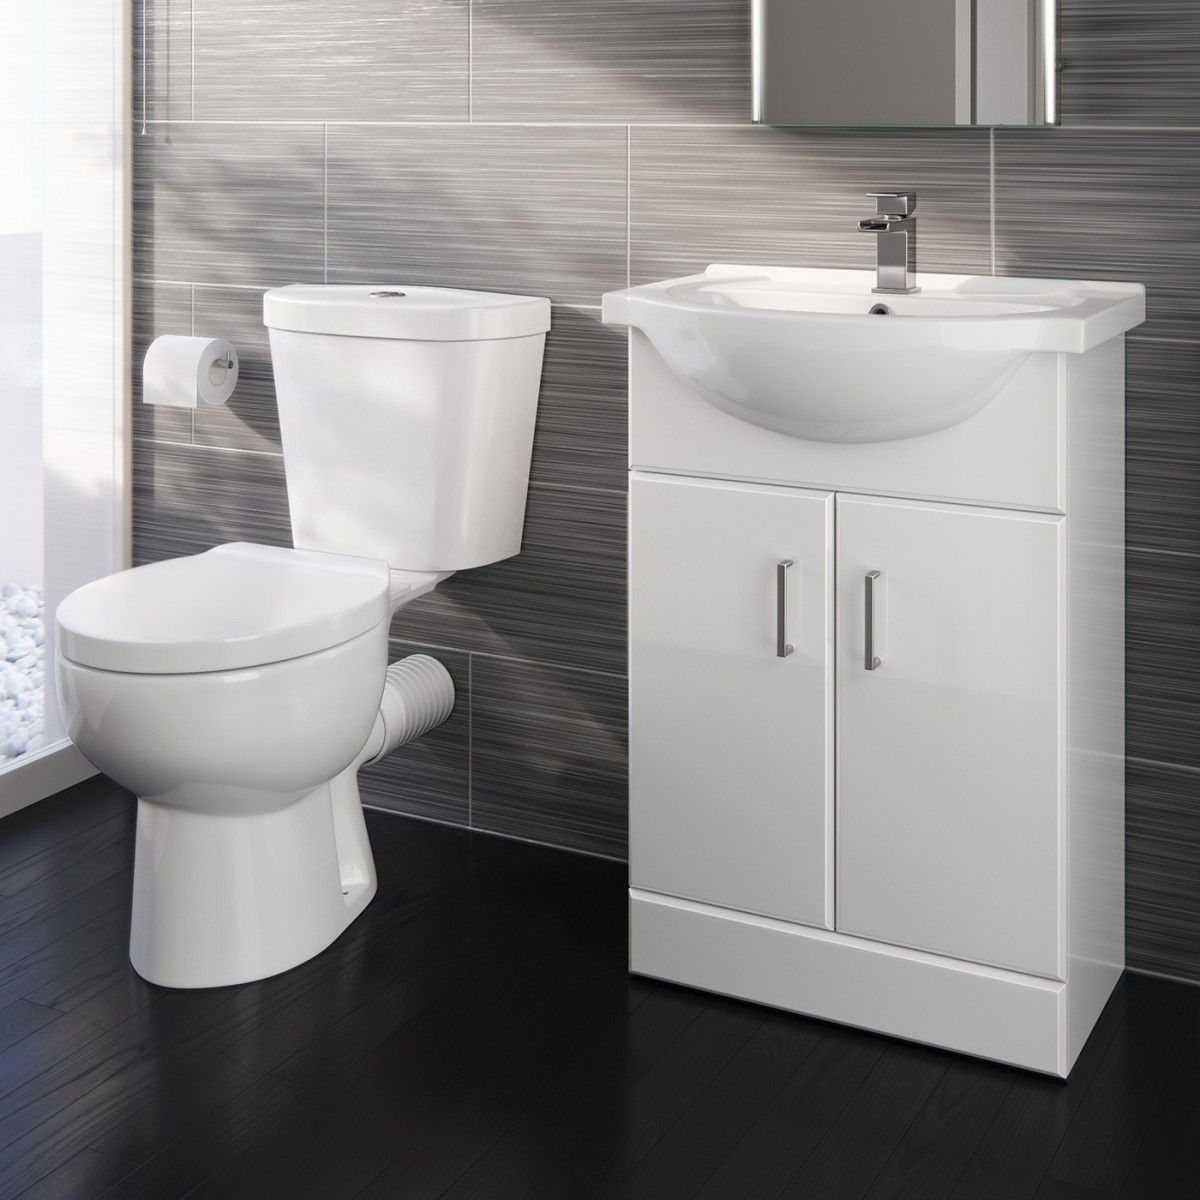 Gloss White Bathroom Furniture Set In 2020 White Bathroom Furniture Bathroom Furniture Toilet Sink Unit